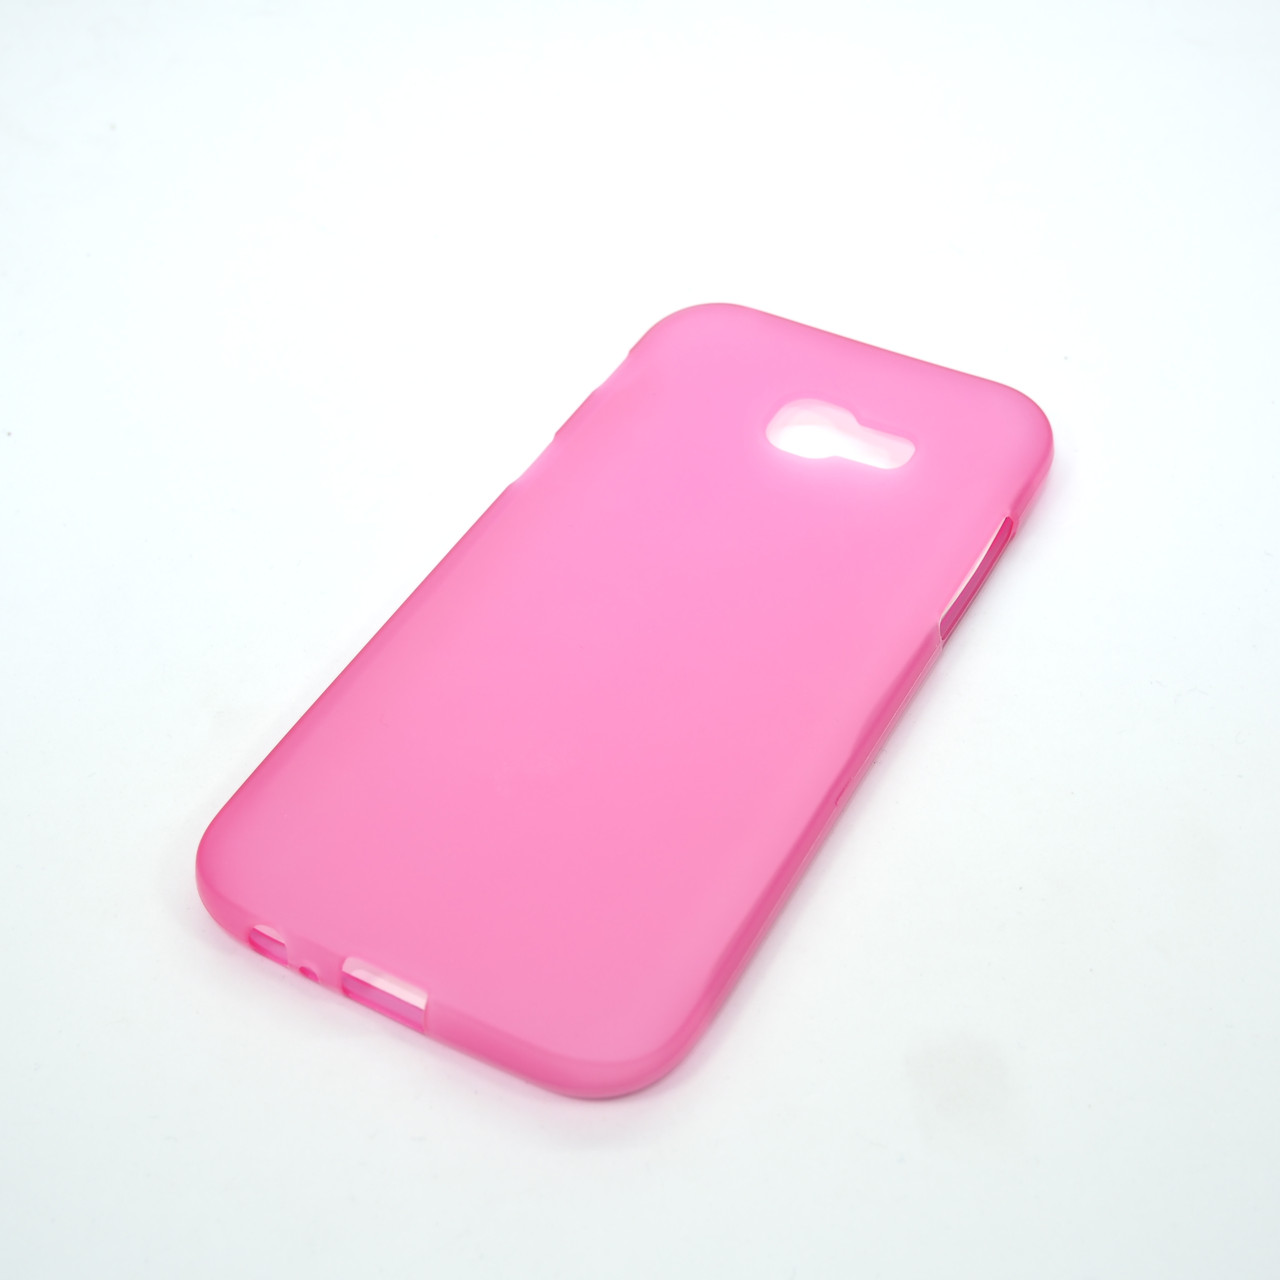 TPU Samsung A520 pink Galaxy A5 (A520) 2017